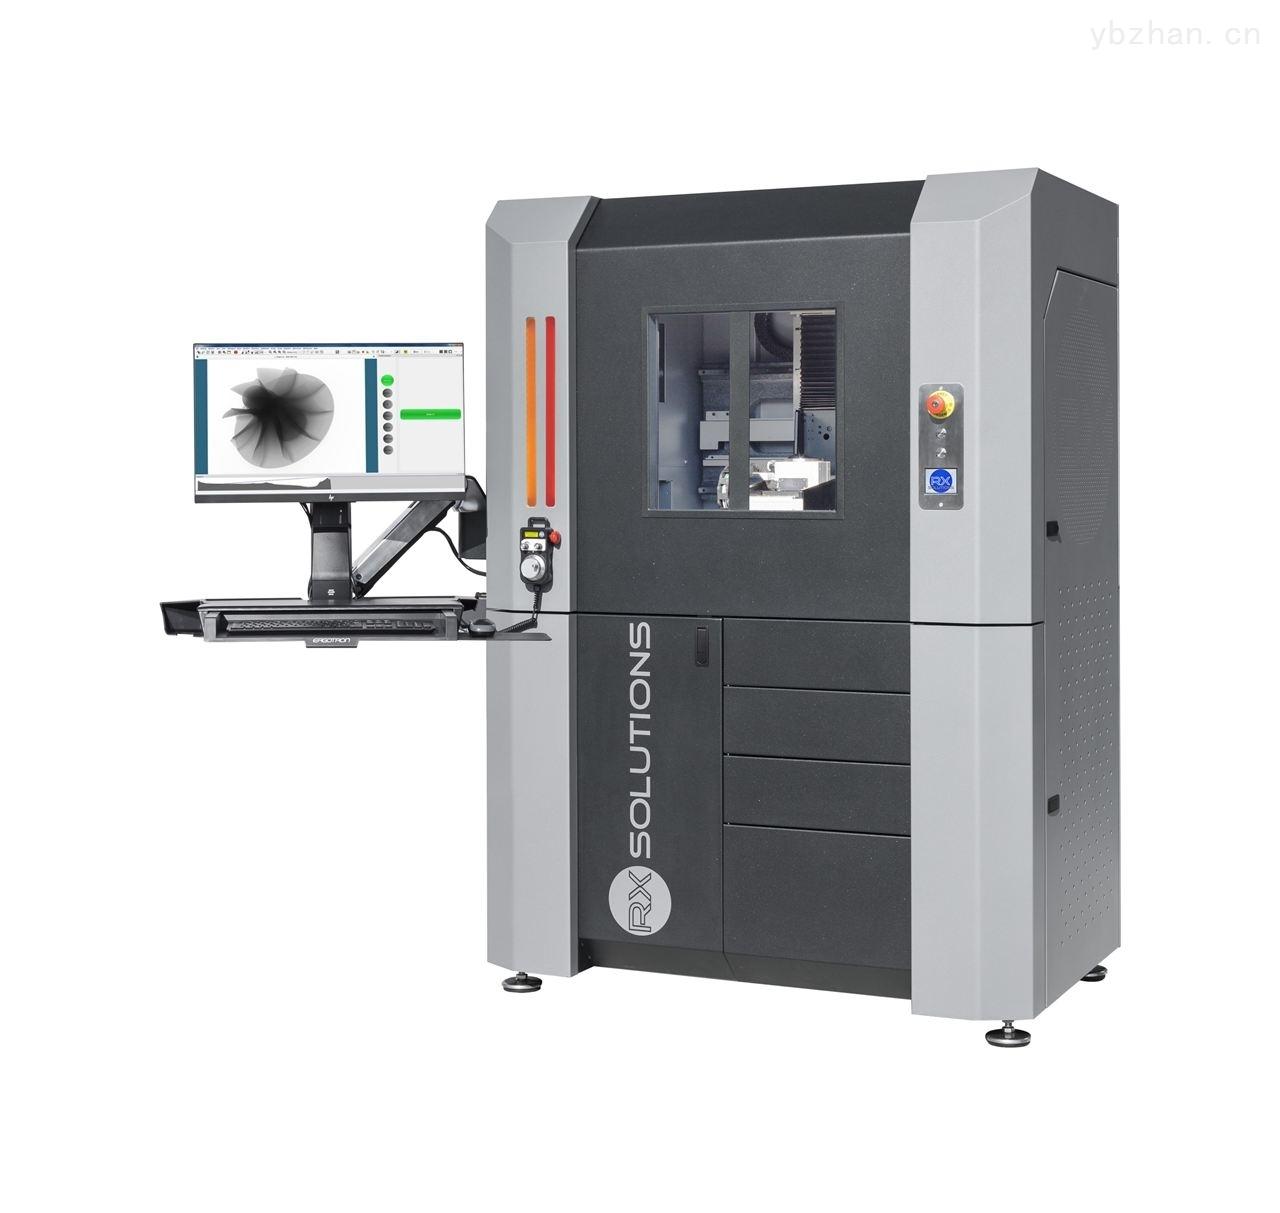 EasyTom 工业CT-EasyTom 高分辨率工业CT系统